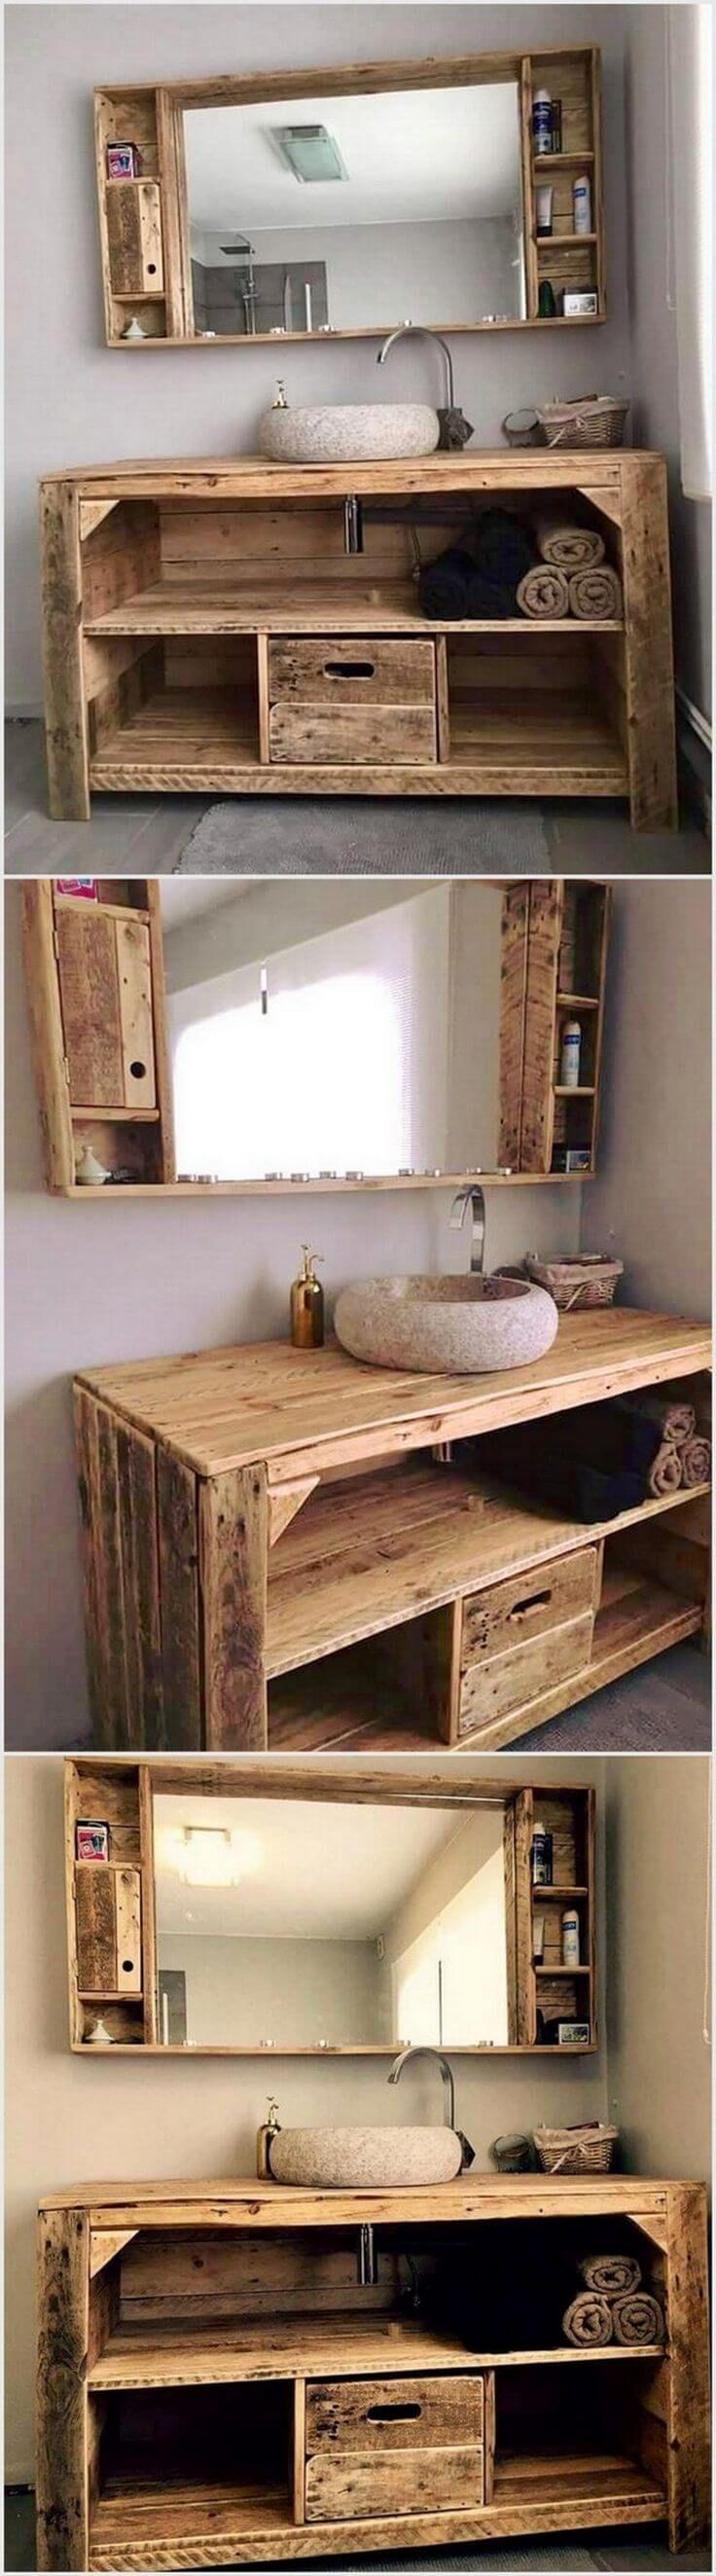 best 25 pallet bathroom ideas on pinterest wood walls